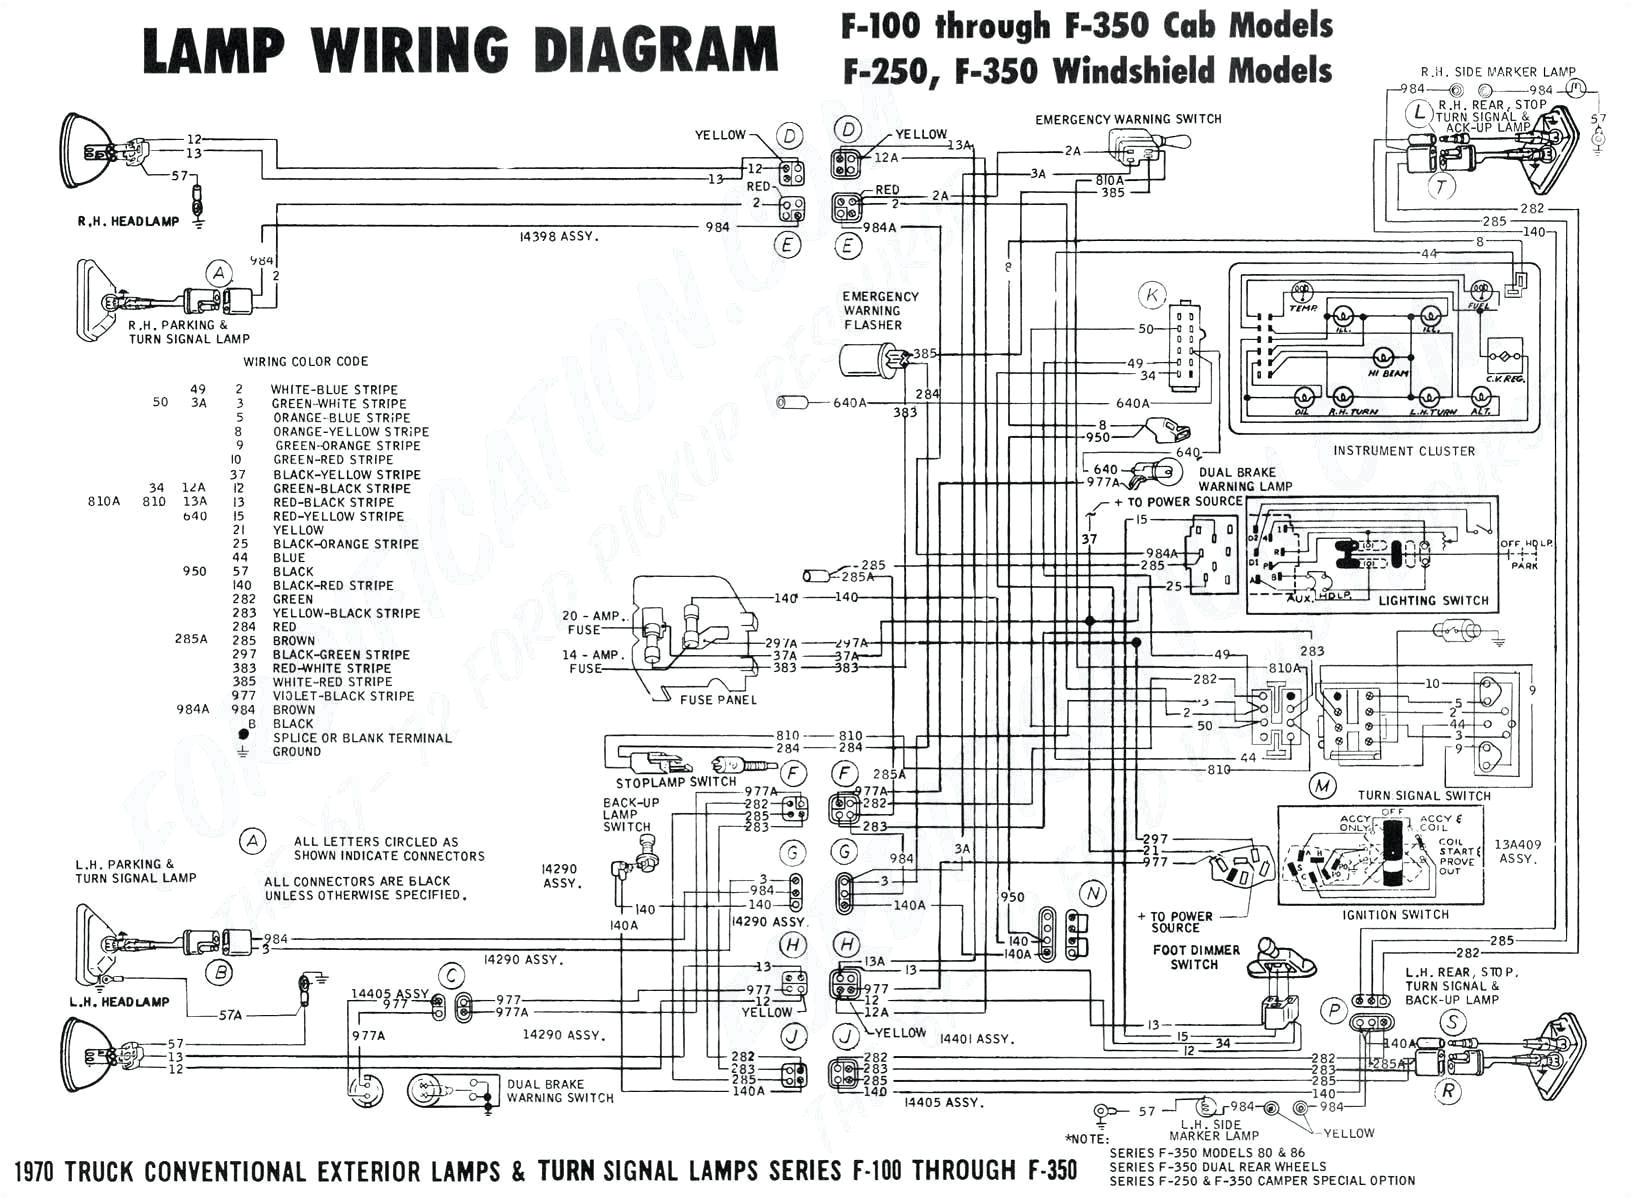 ab powerflex 70 wiring diagram wiring diagram database 16 fresh powerflex 70 wiring diagram